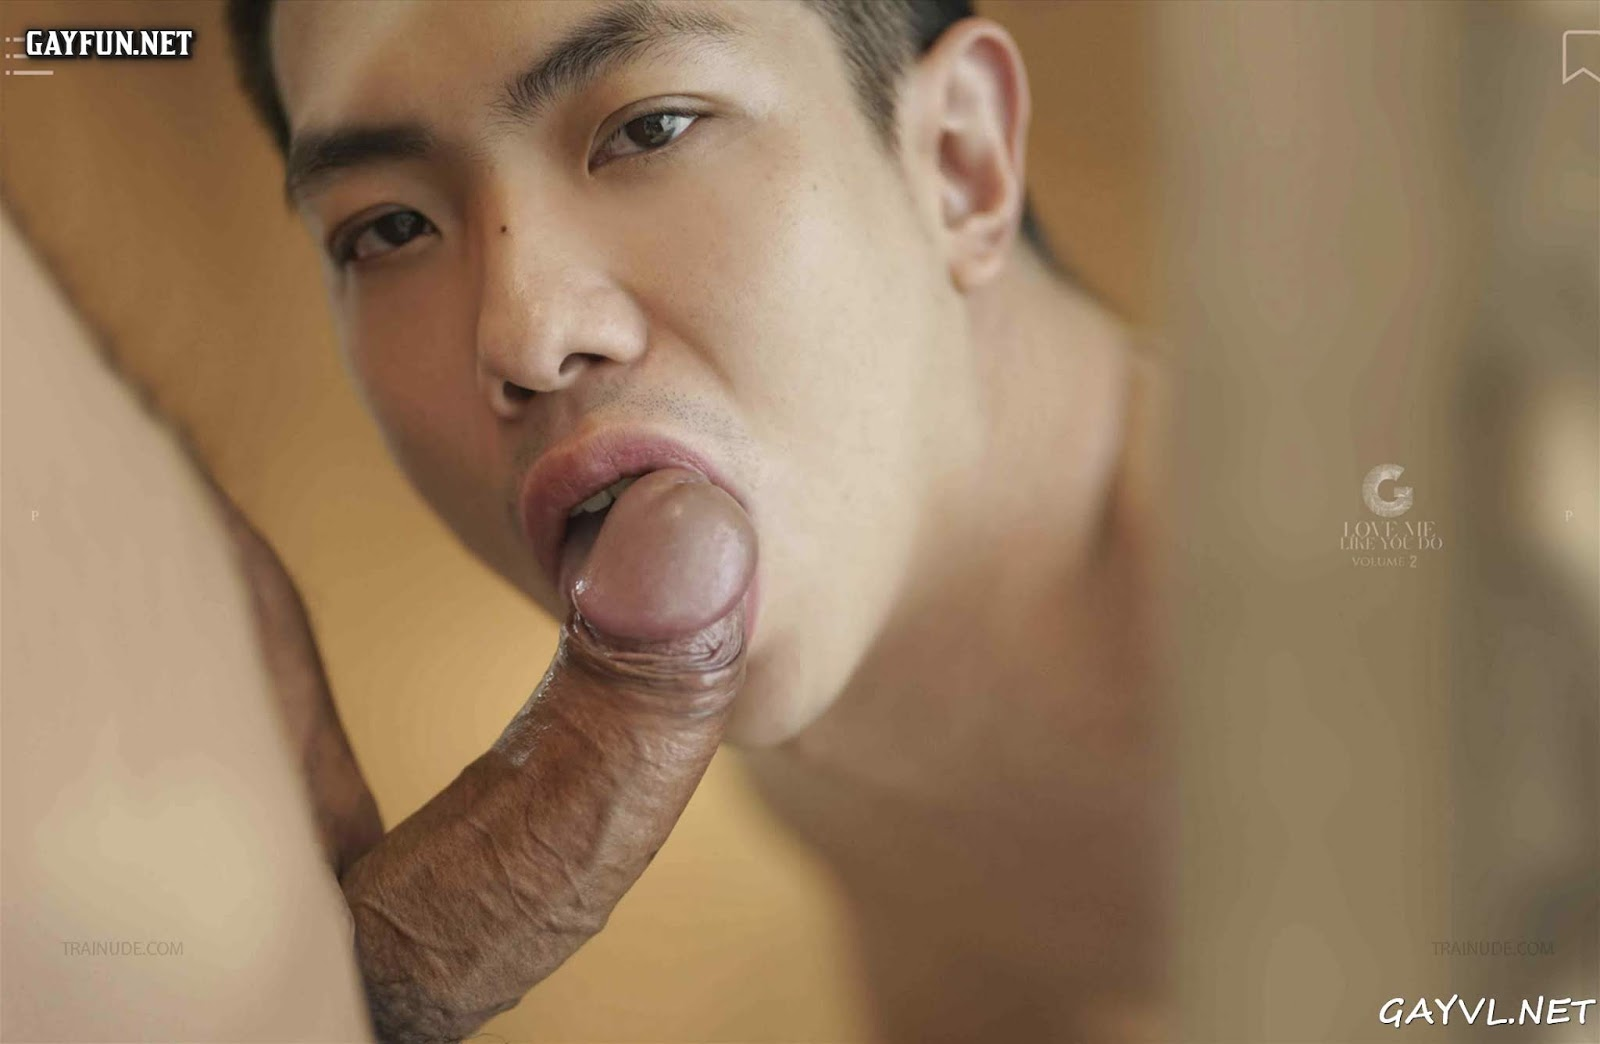 Gay Photo P